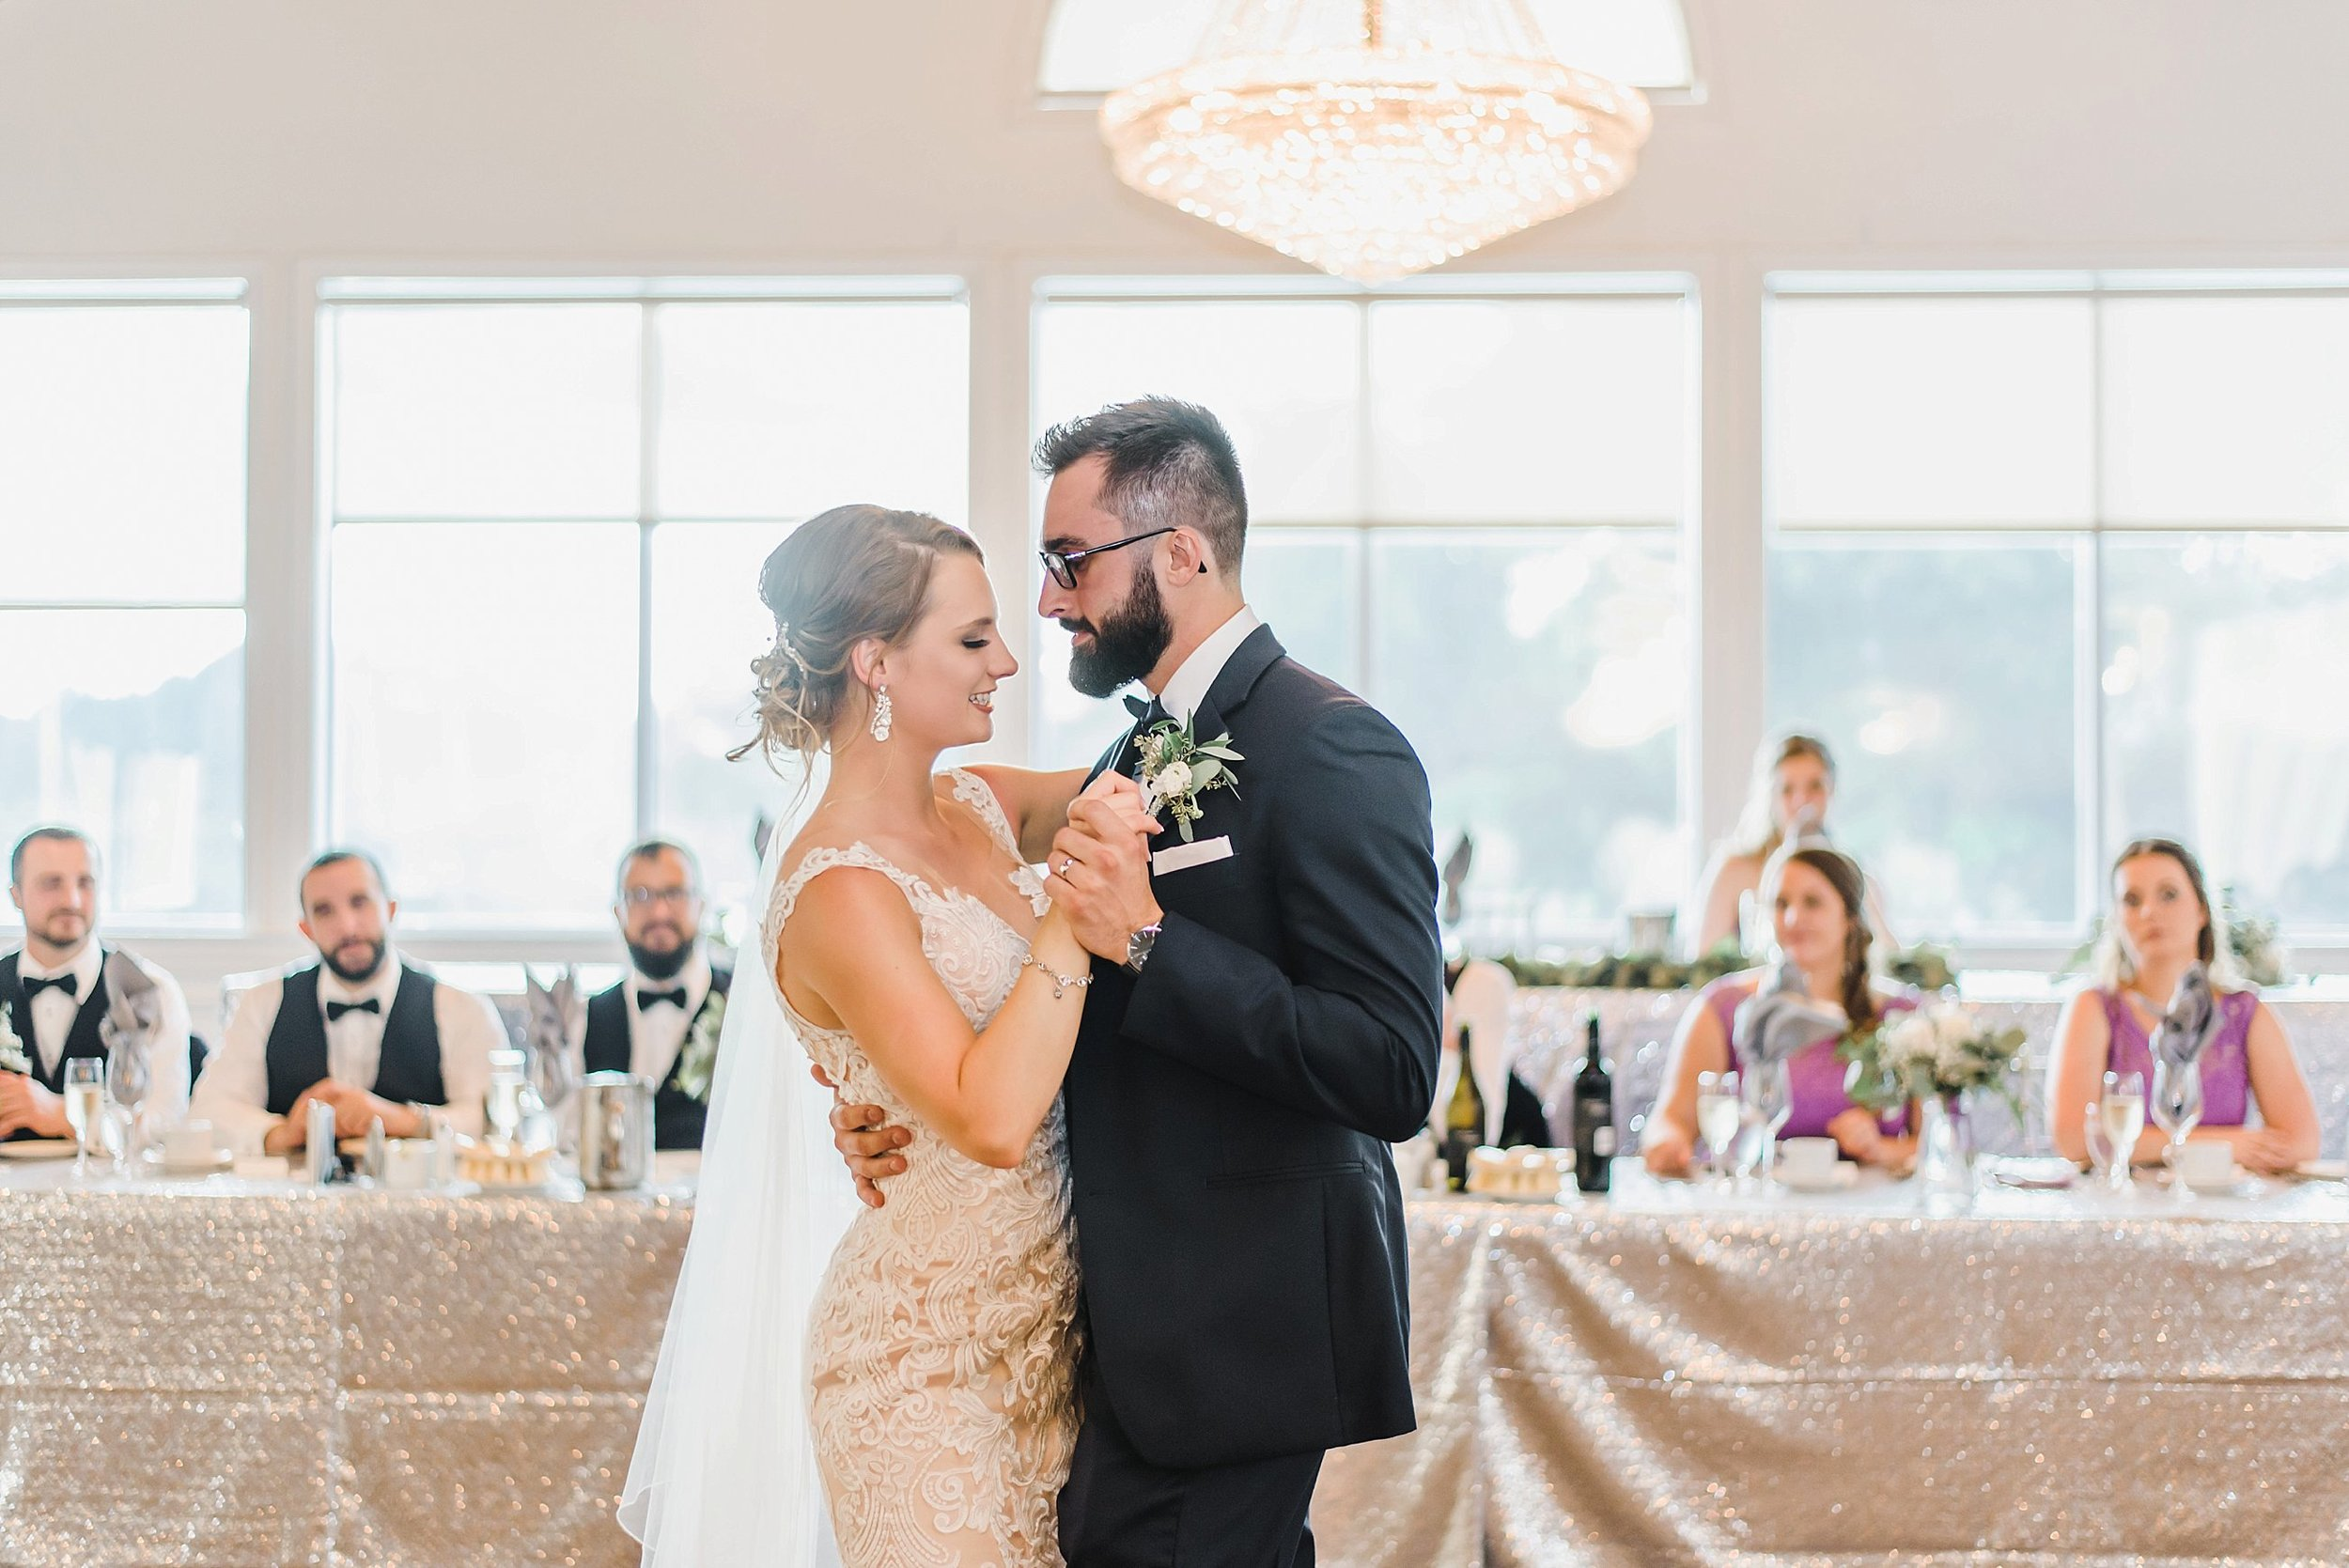 light airy indie fine art ottawa wedding photographer | Ali and Batoul Photography_1334.jpg